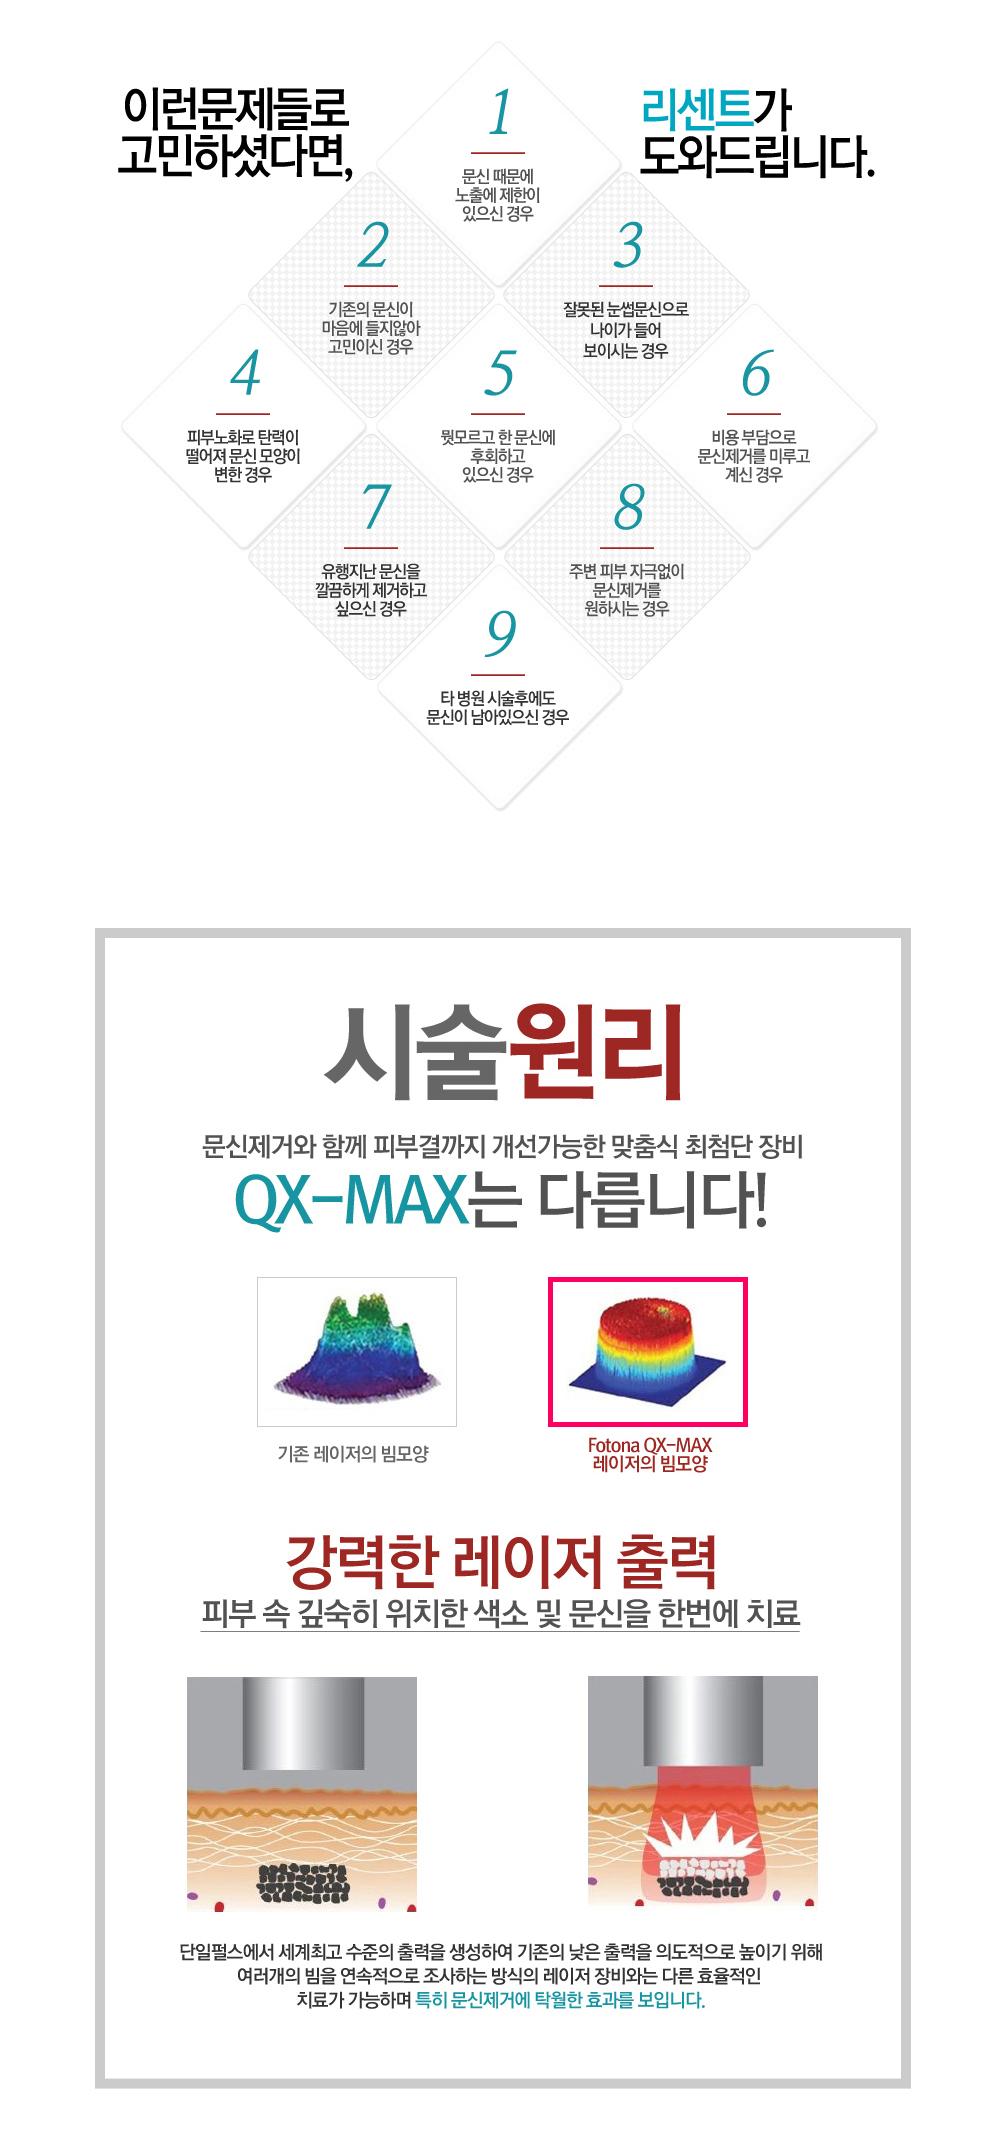 lisent qx-max p4.jpg